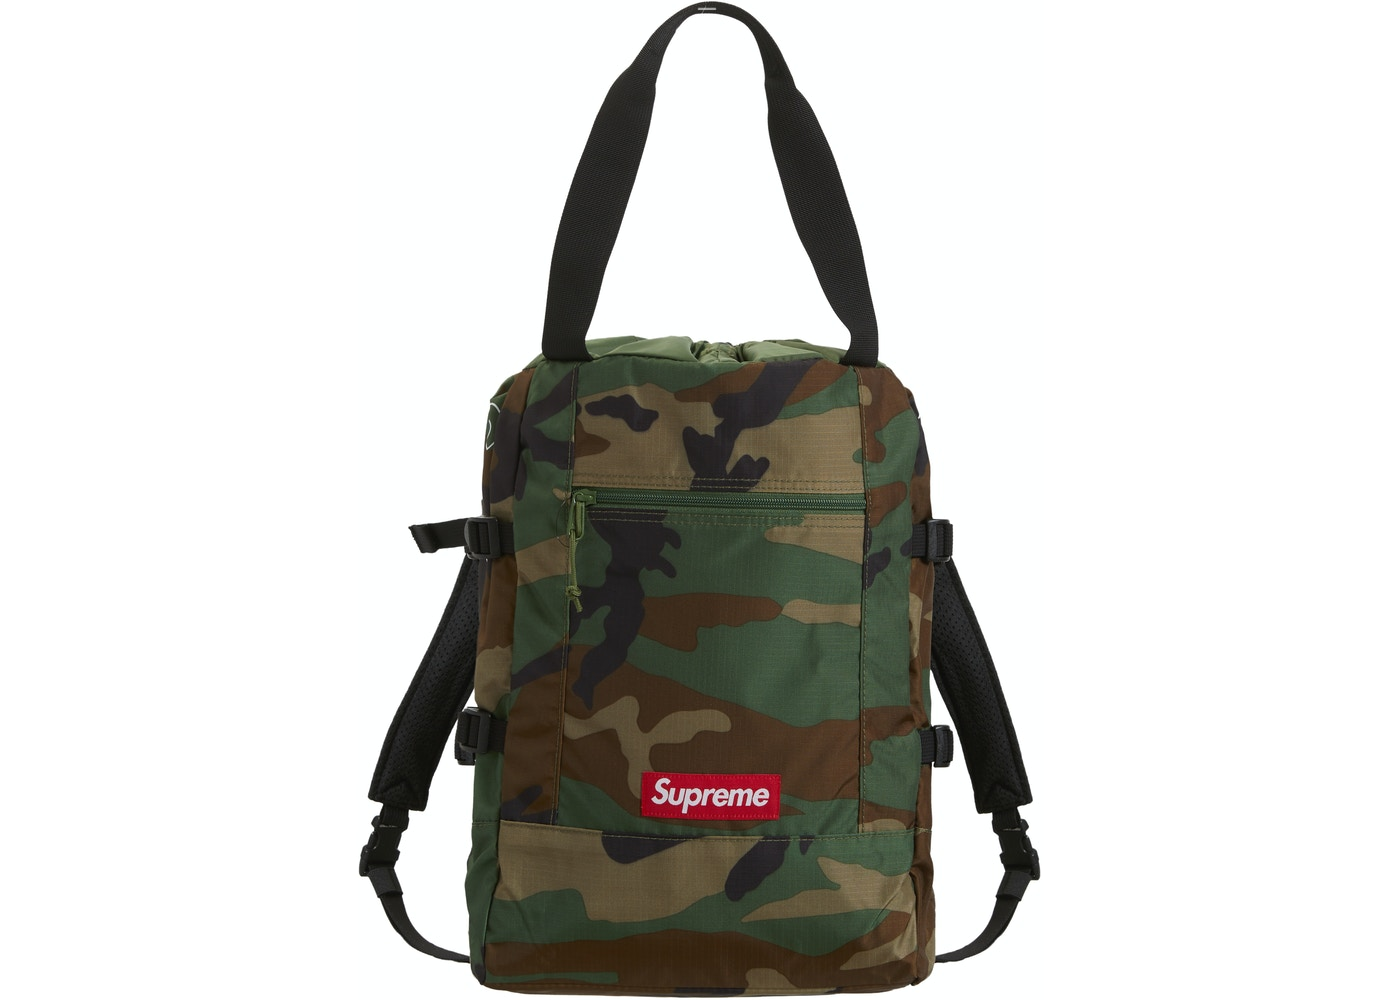 Supreme Tote Backpack Woodland Camo